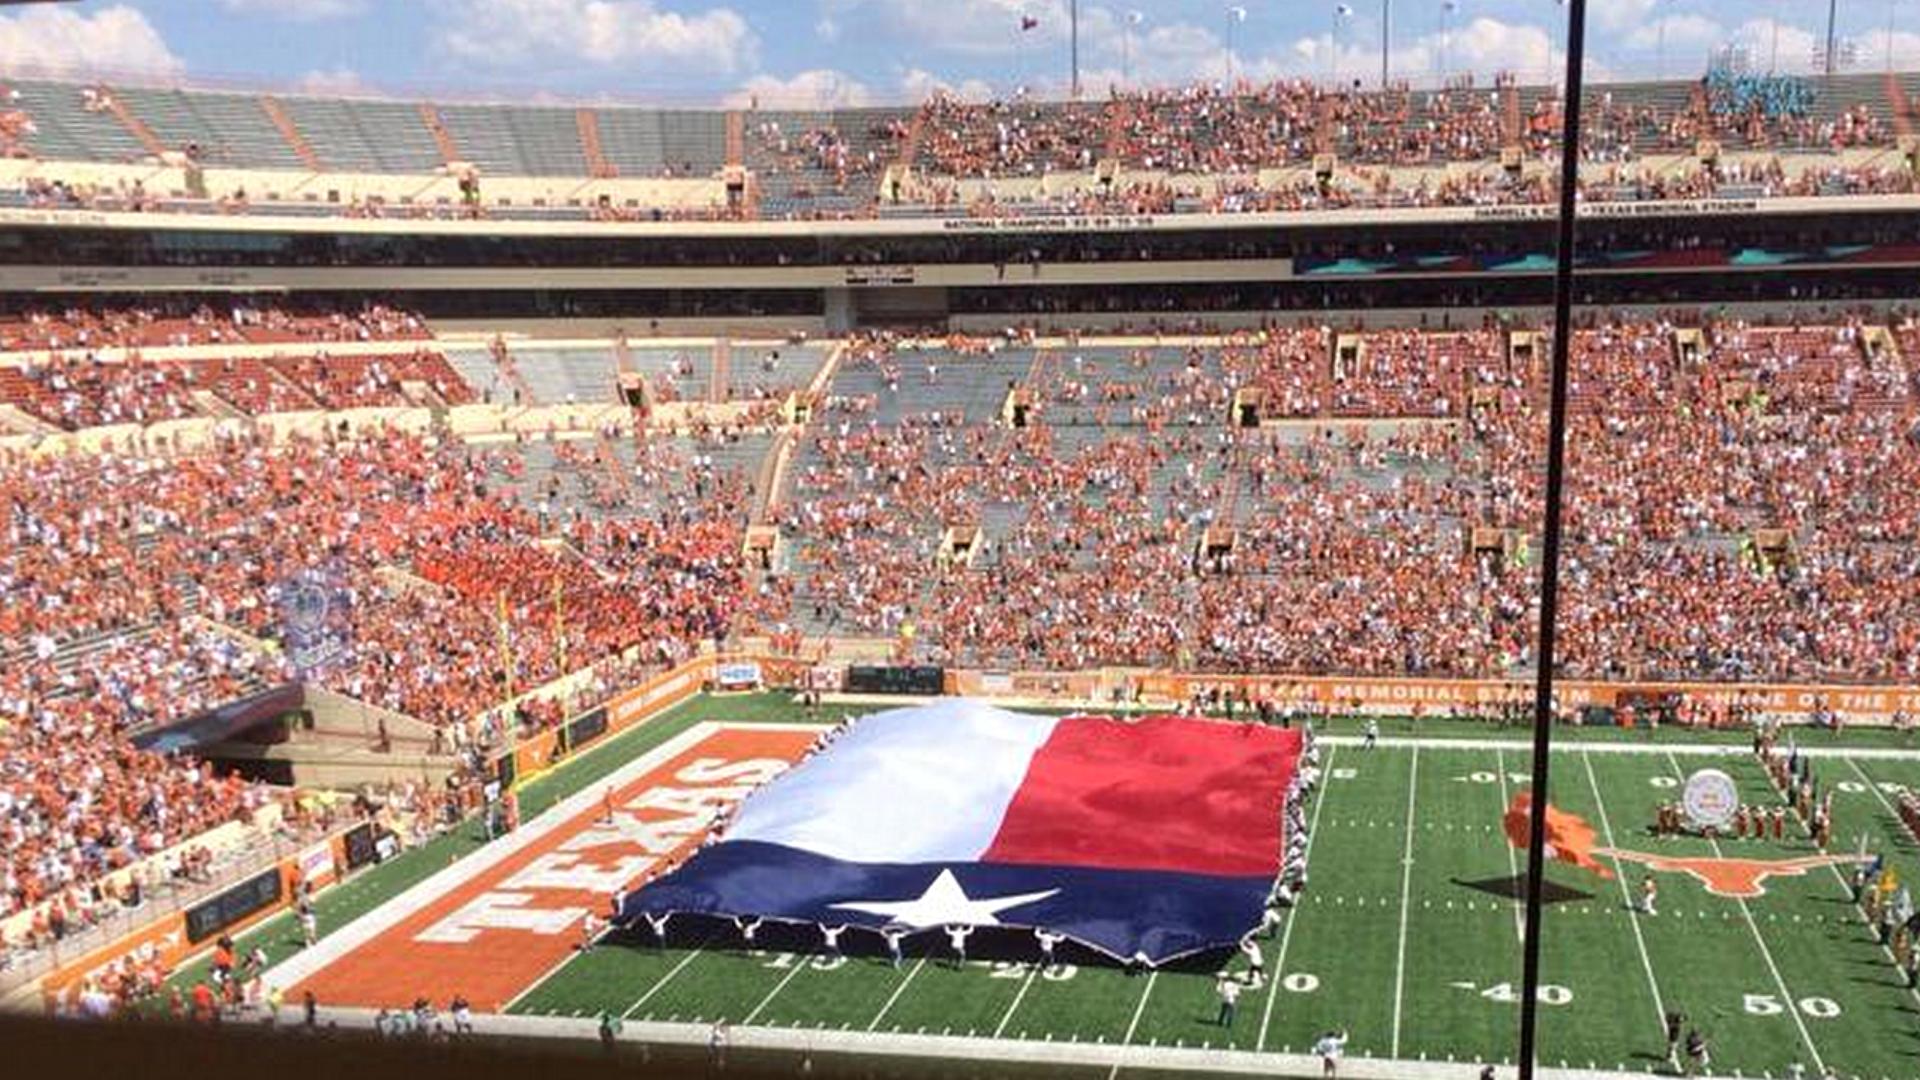 Fans at Darrell K Royal-Texas Memorial Stadium just before kickoff